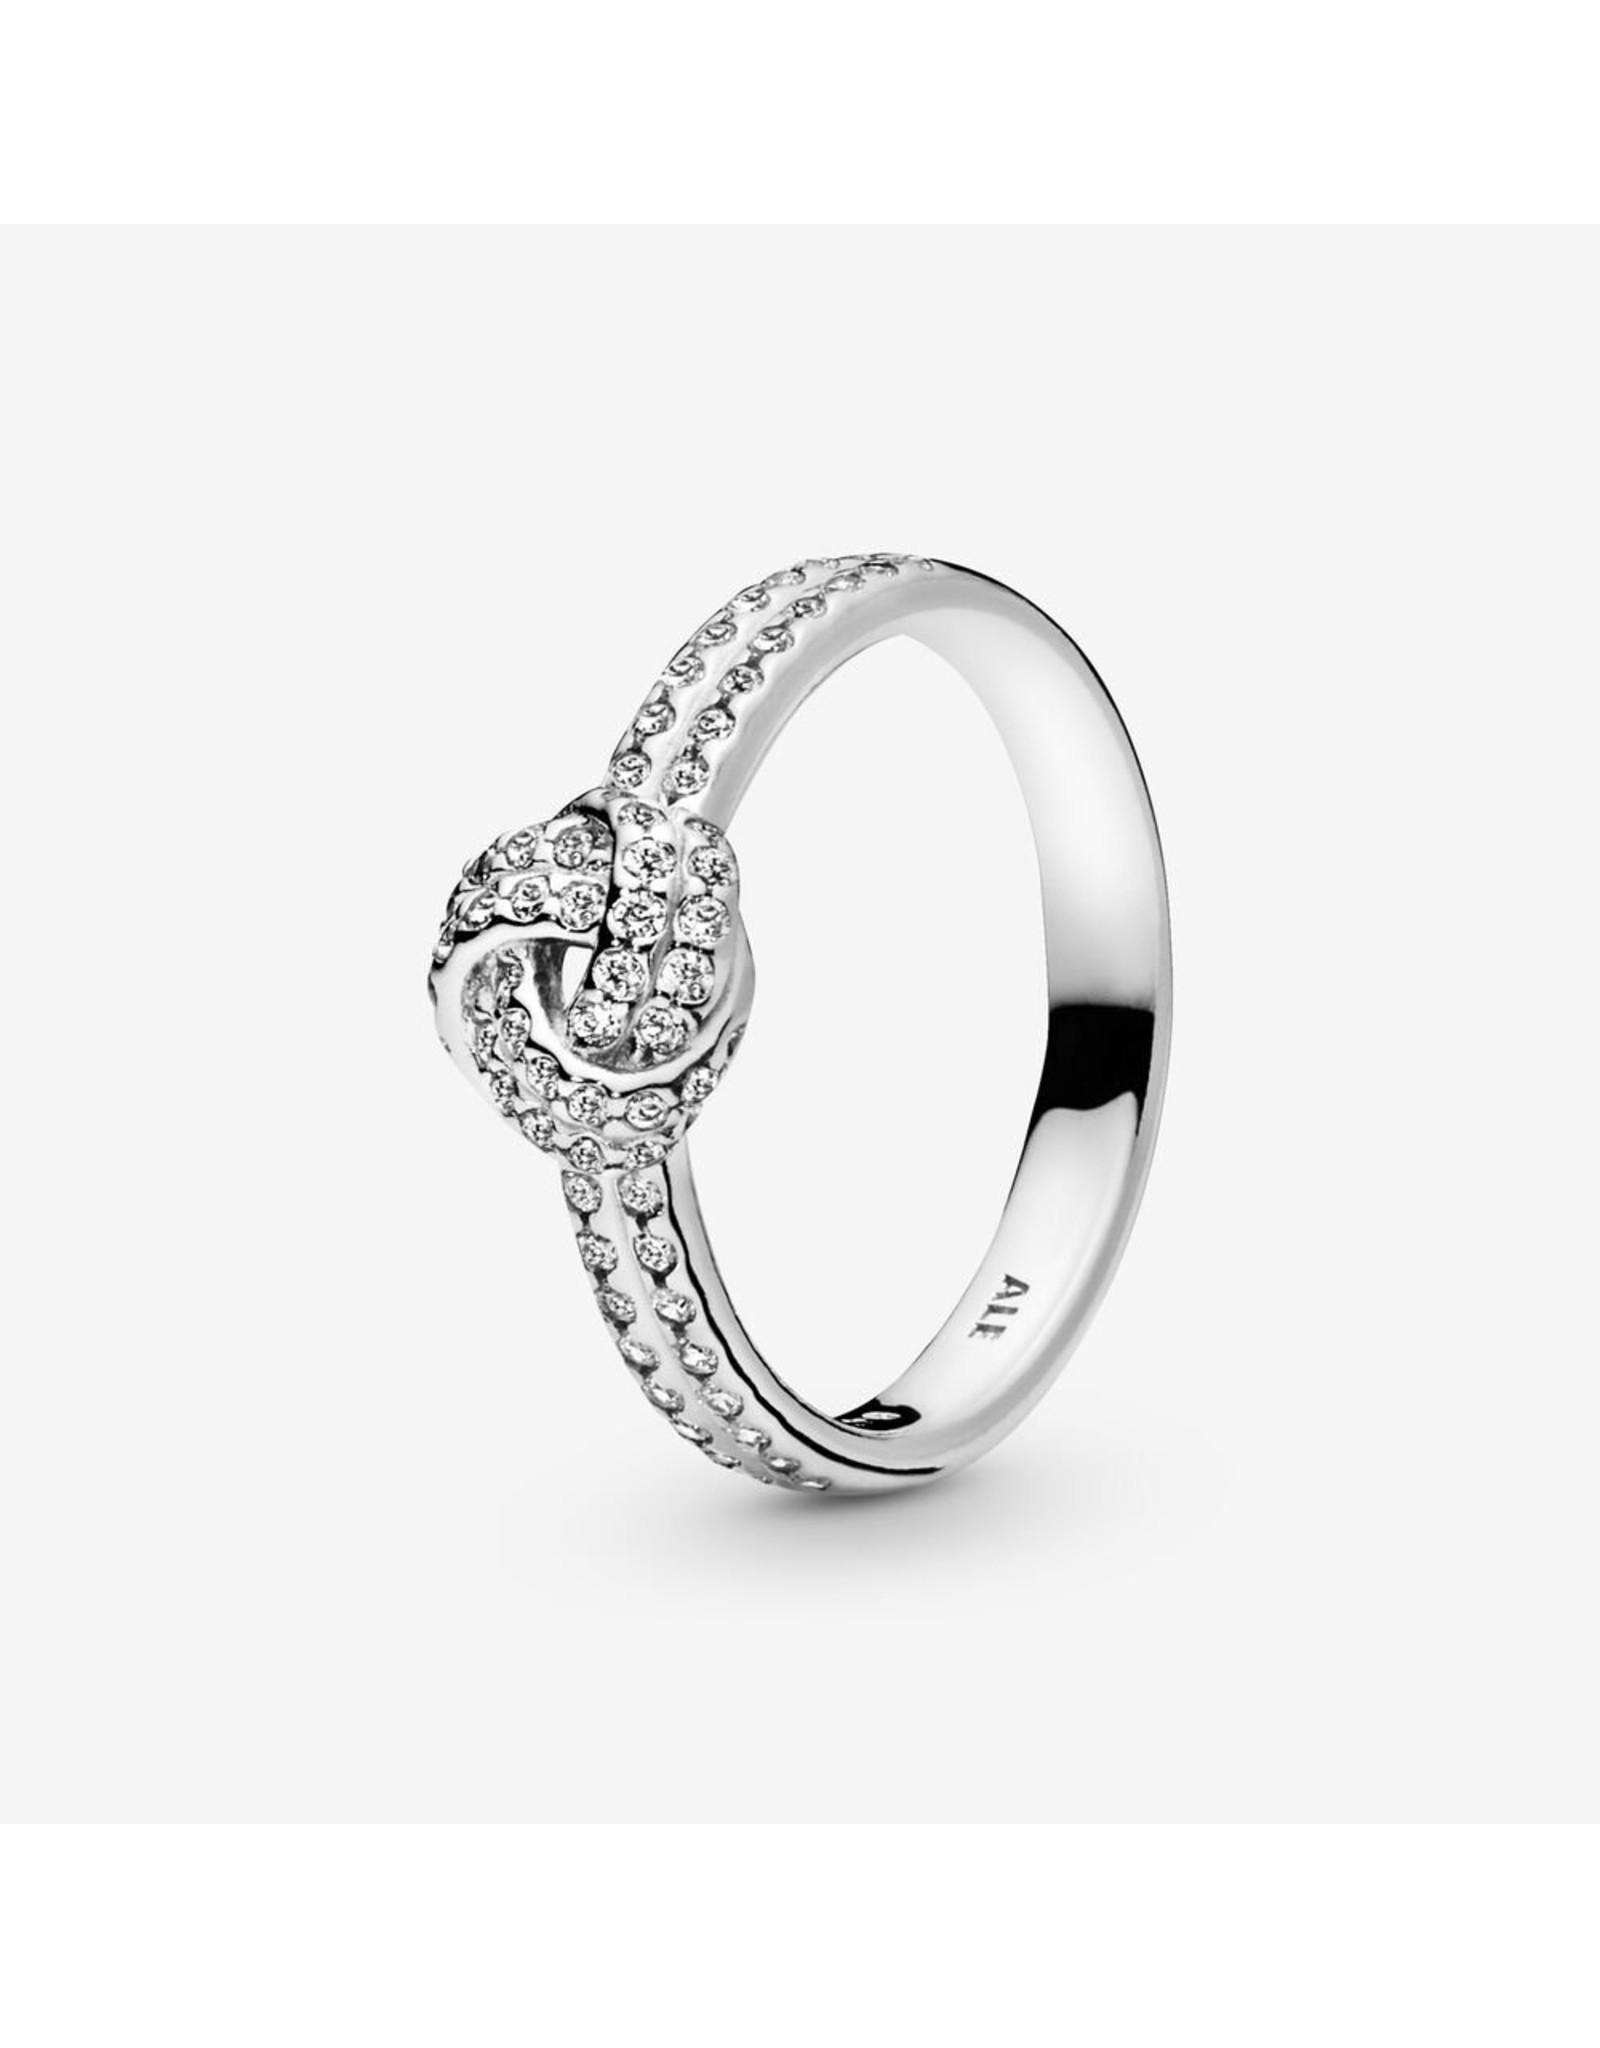 Pandora Pandora Ring,190997CZ, Sparkling Love Knot